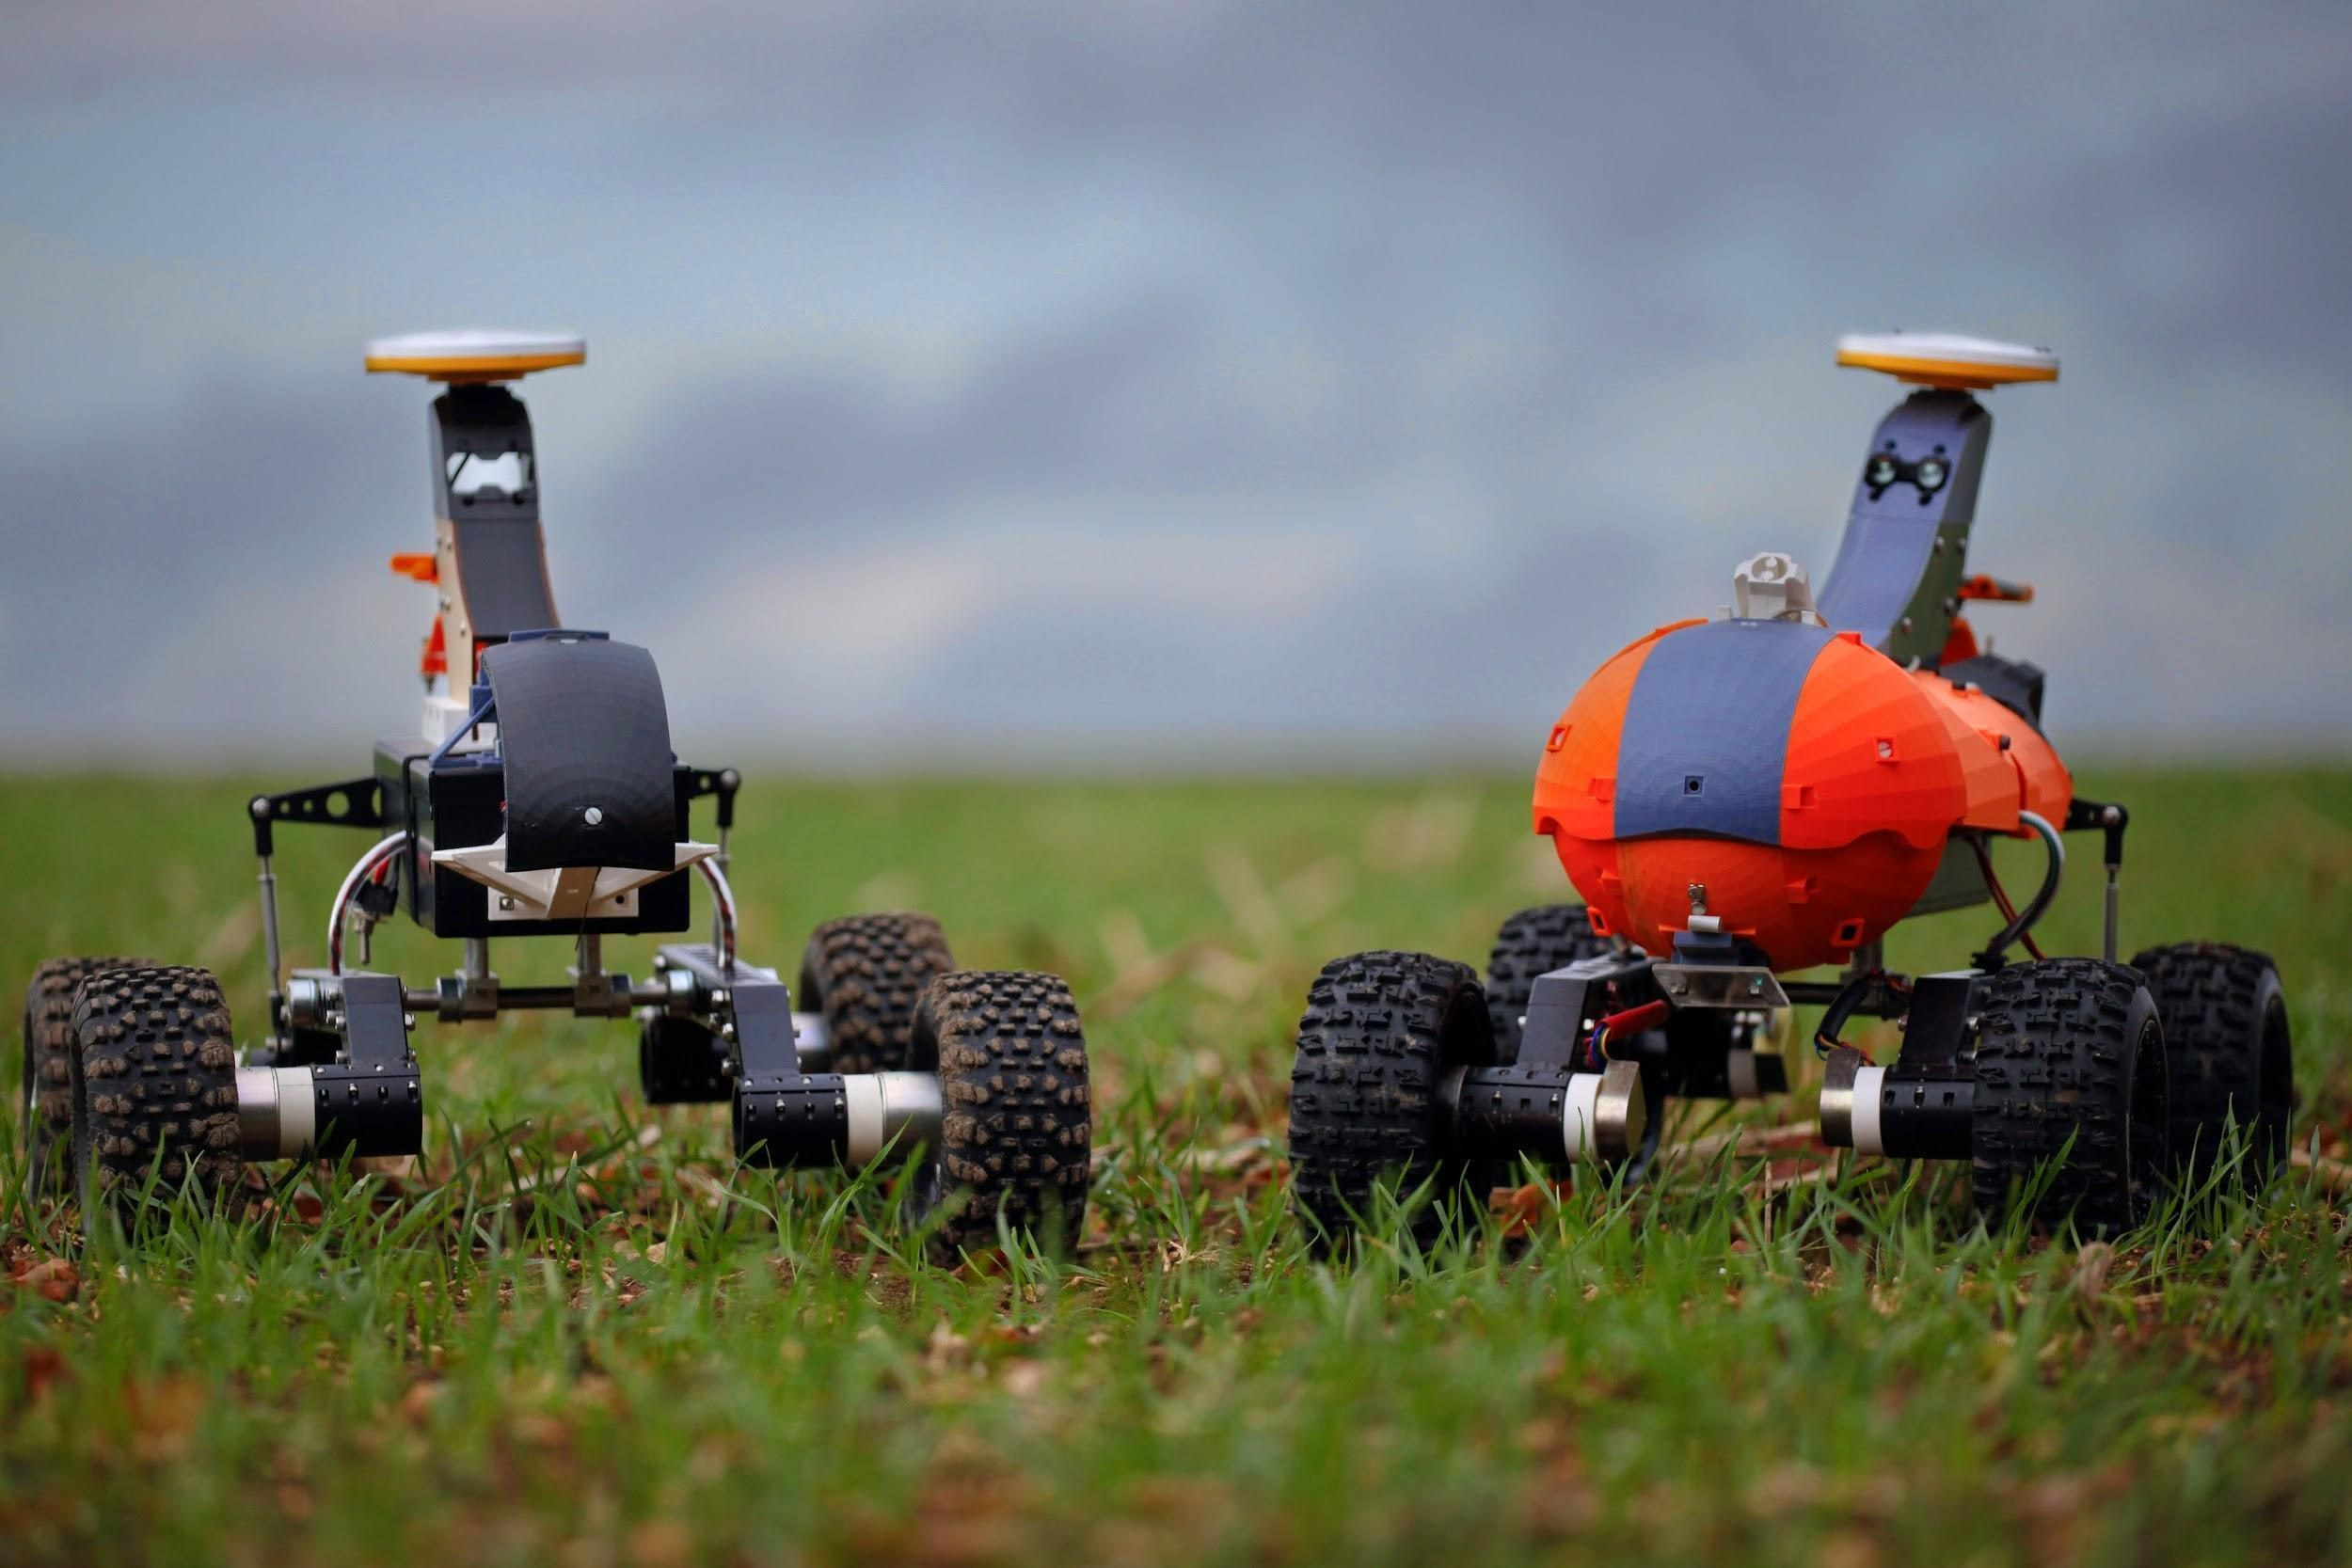 Prototype robots. Source: Small Robot Company